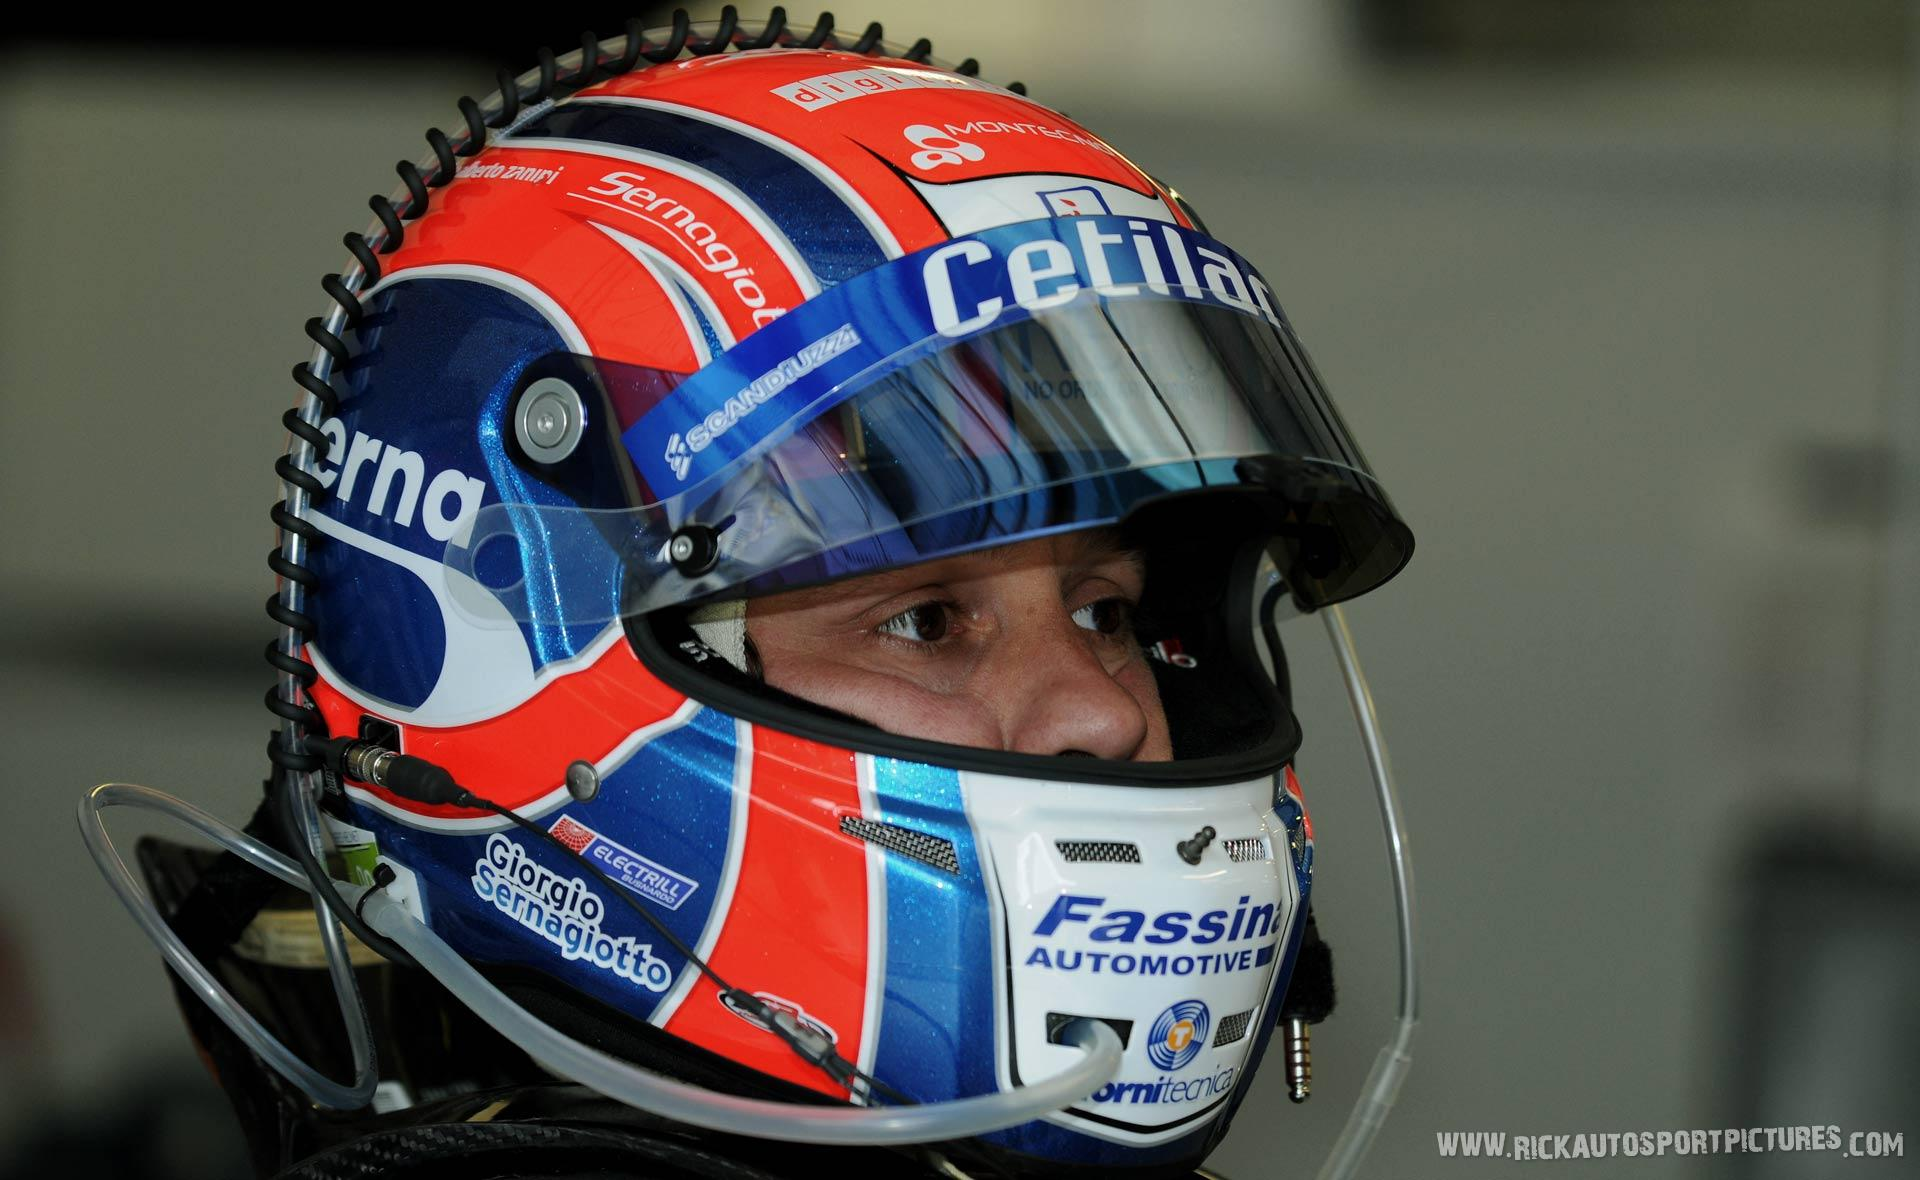 Giorgio Sernagiotto Cetilar Villorba Corse silverstone 2017